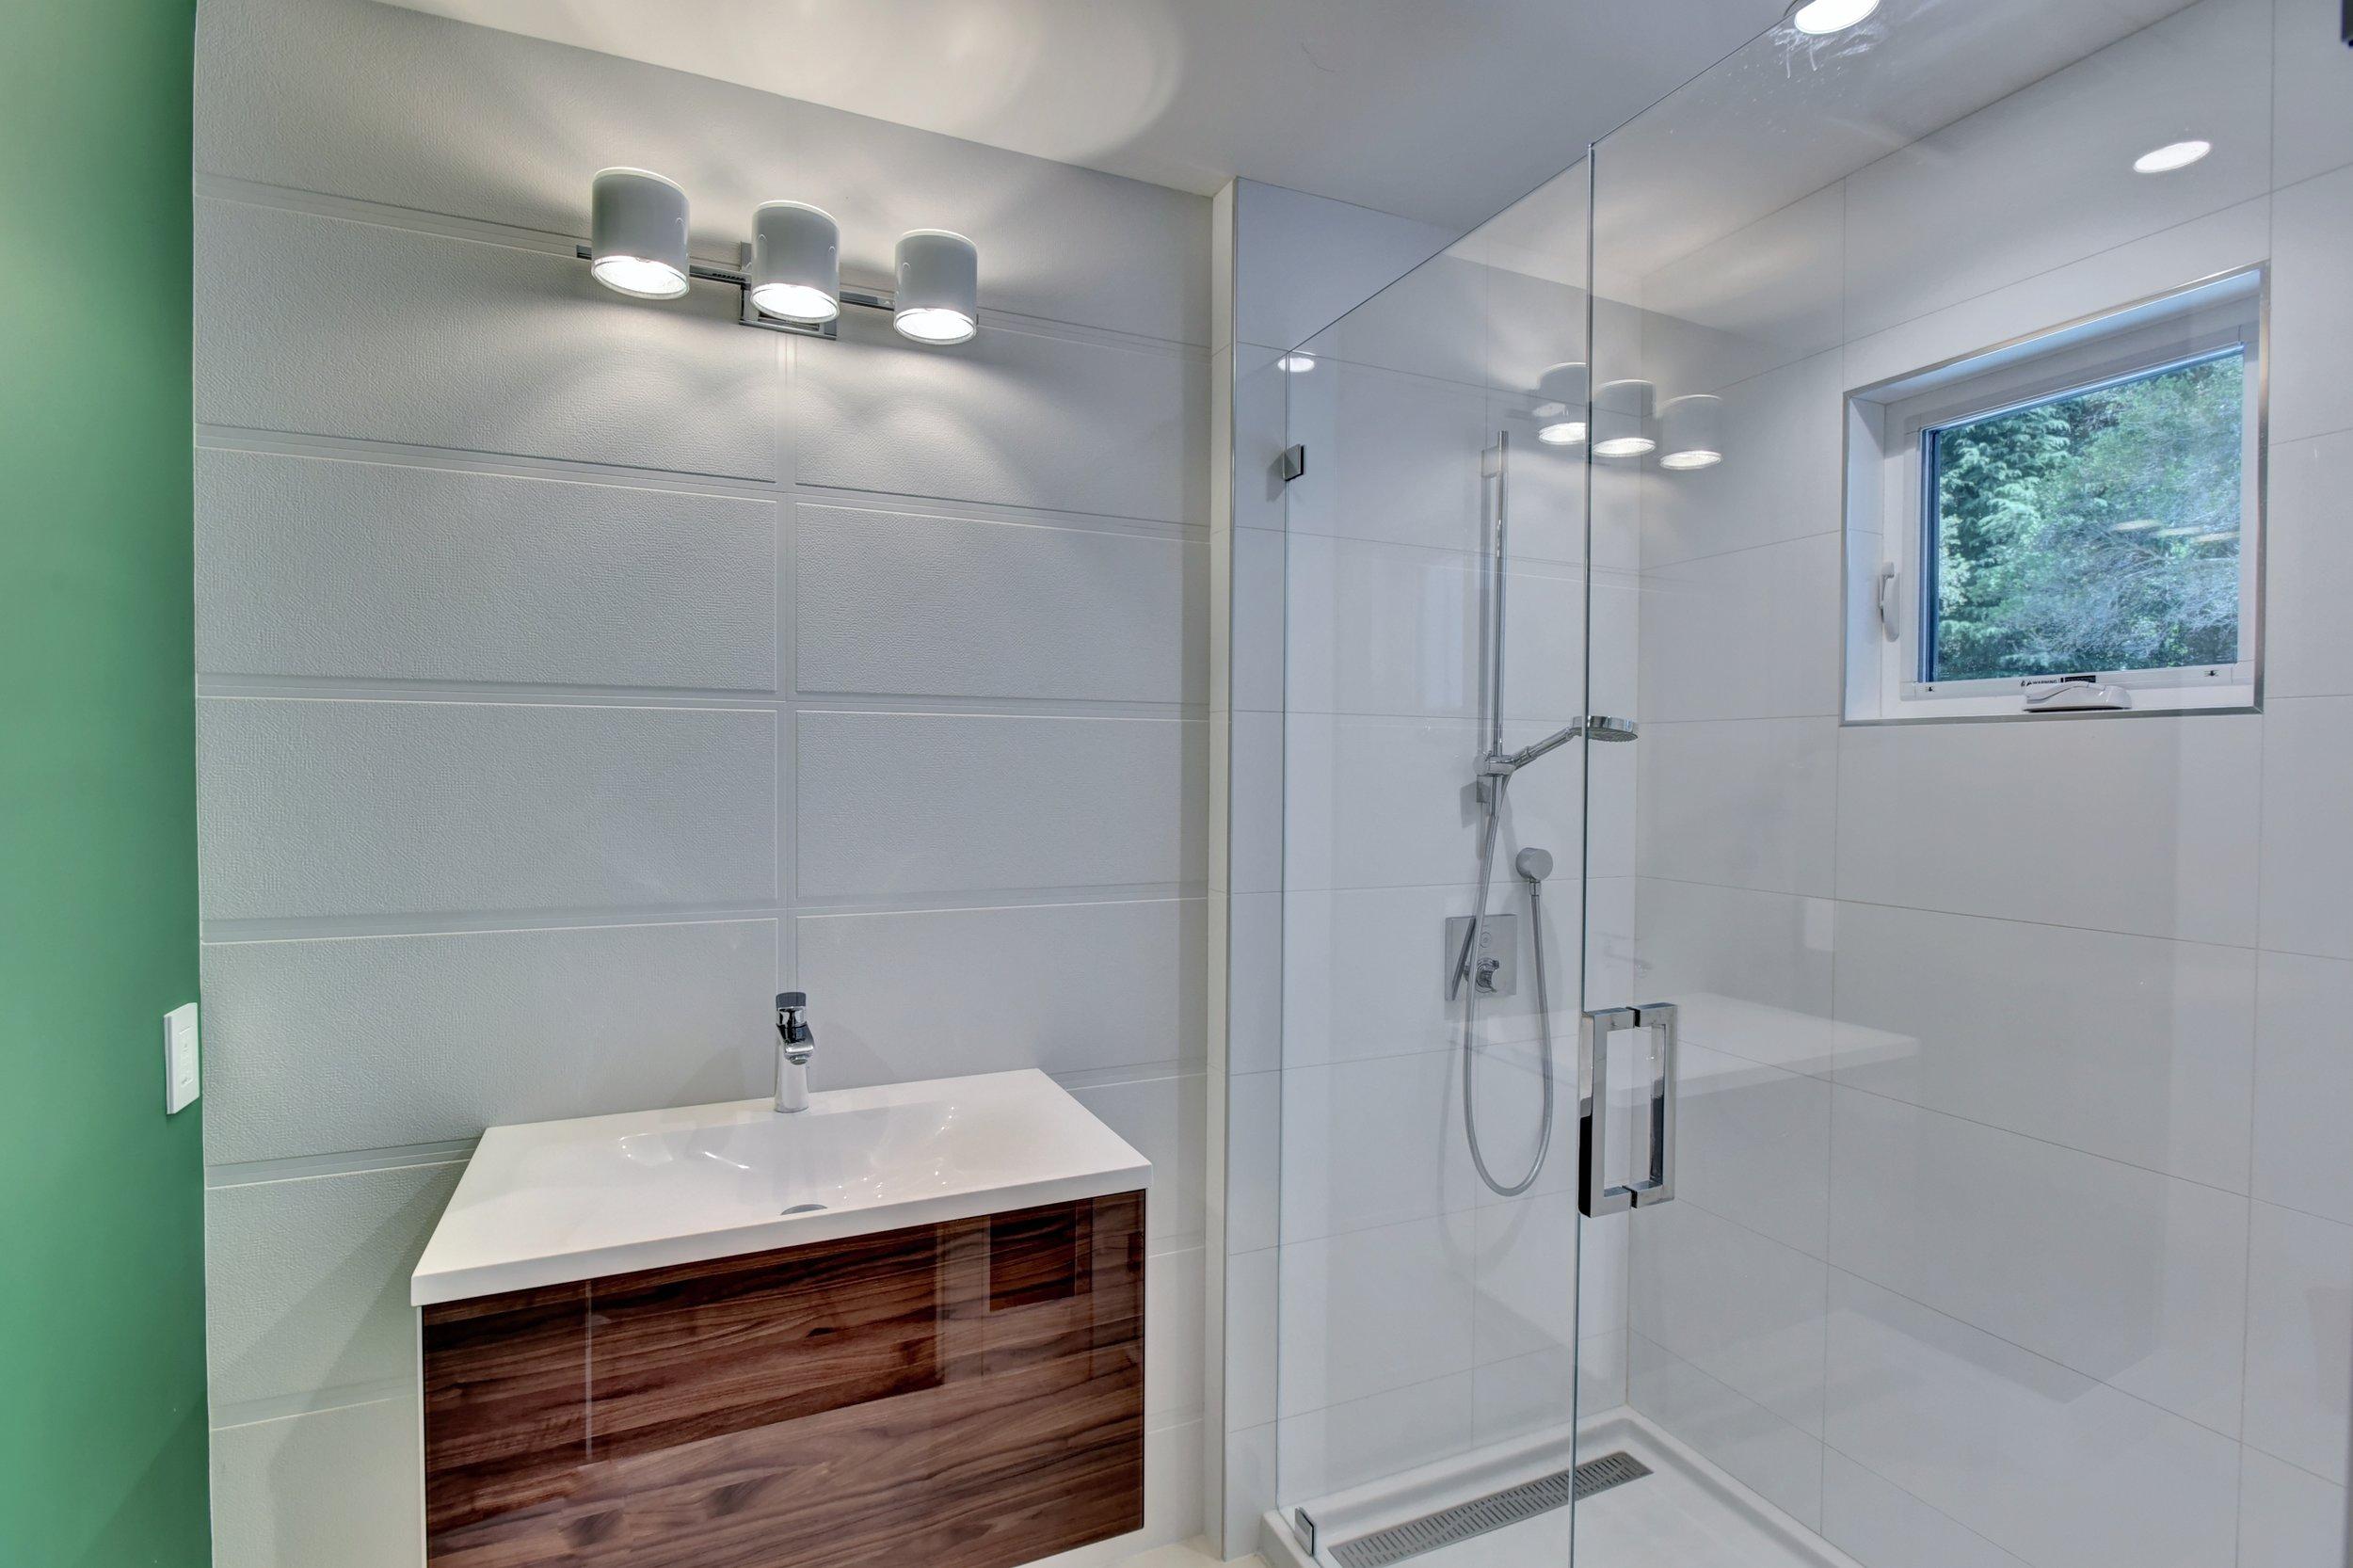 33_upstairs bath1.jpg